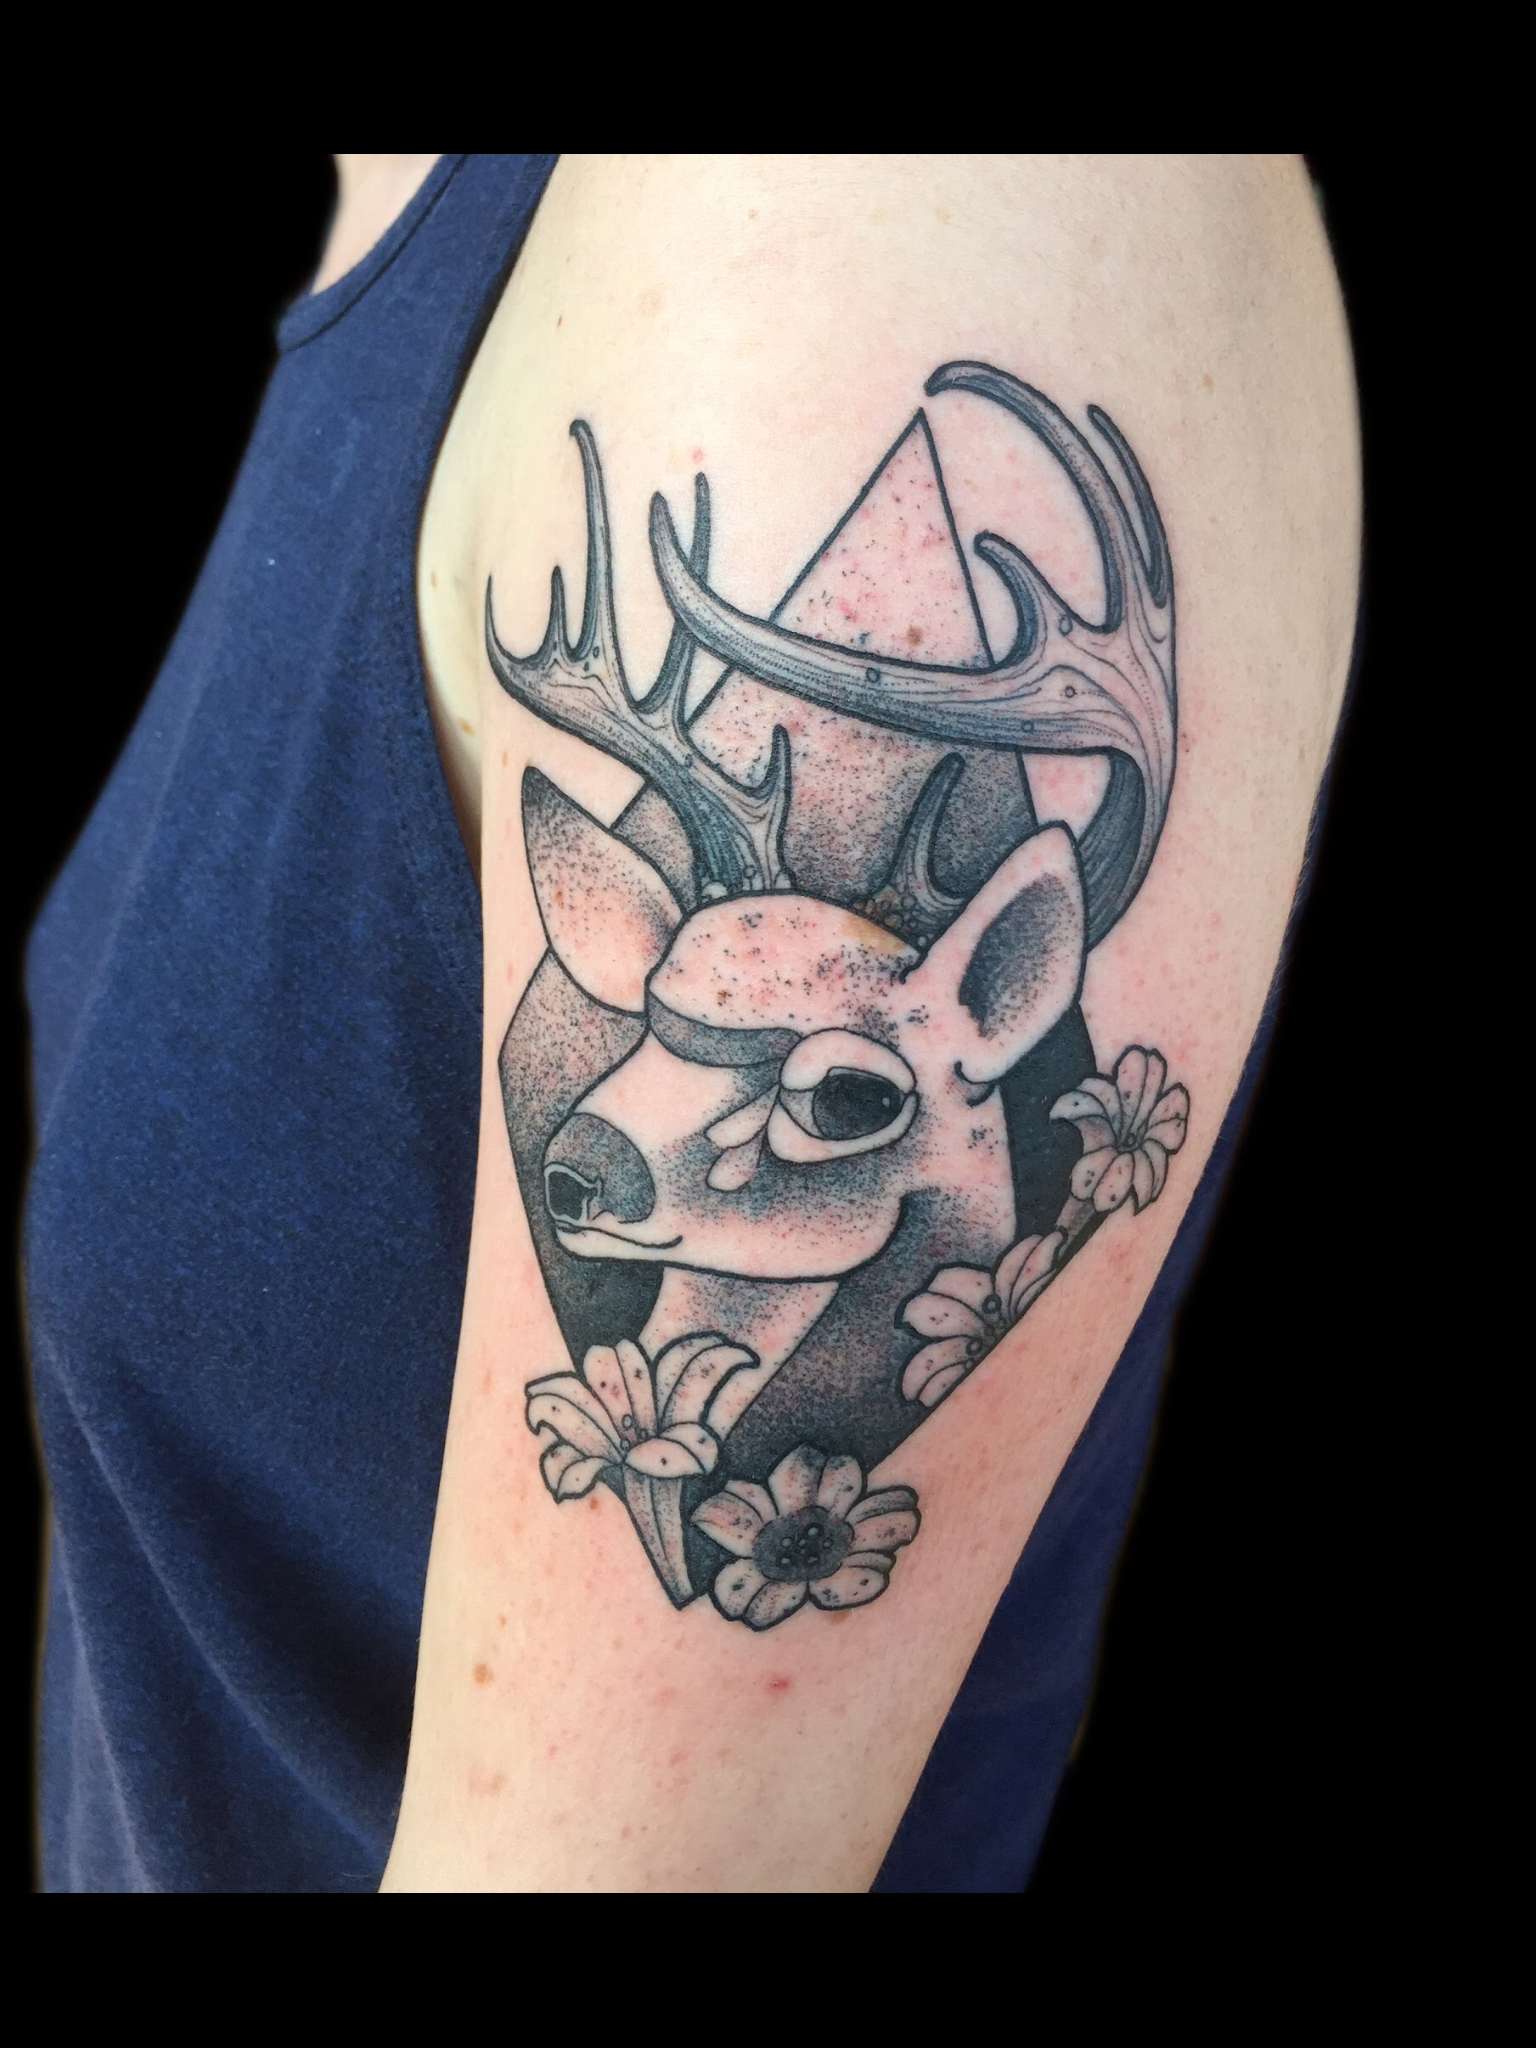 Blackwork deer head geometric tattoo by Barham Williams